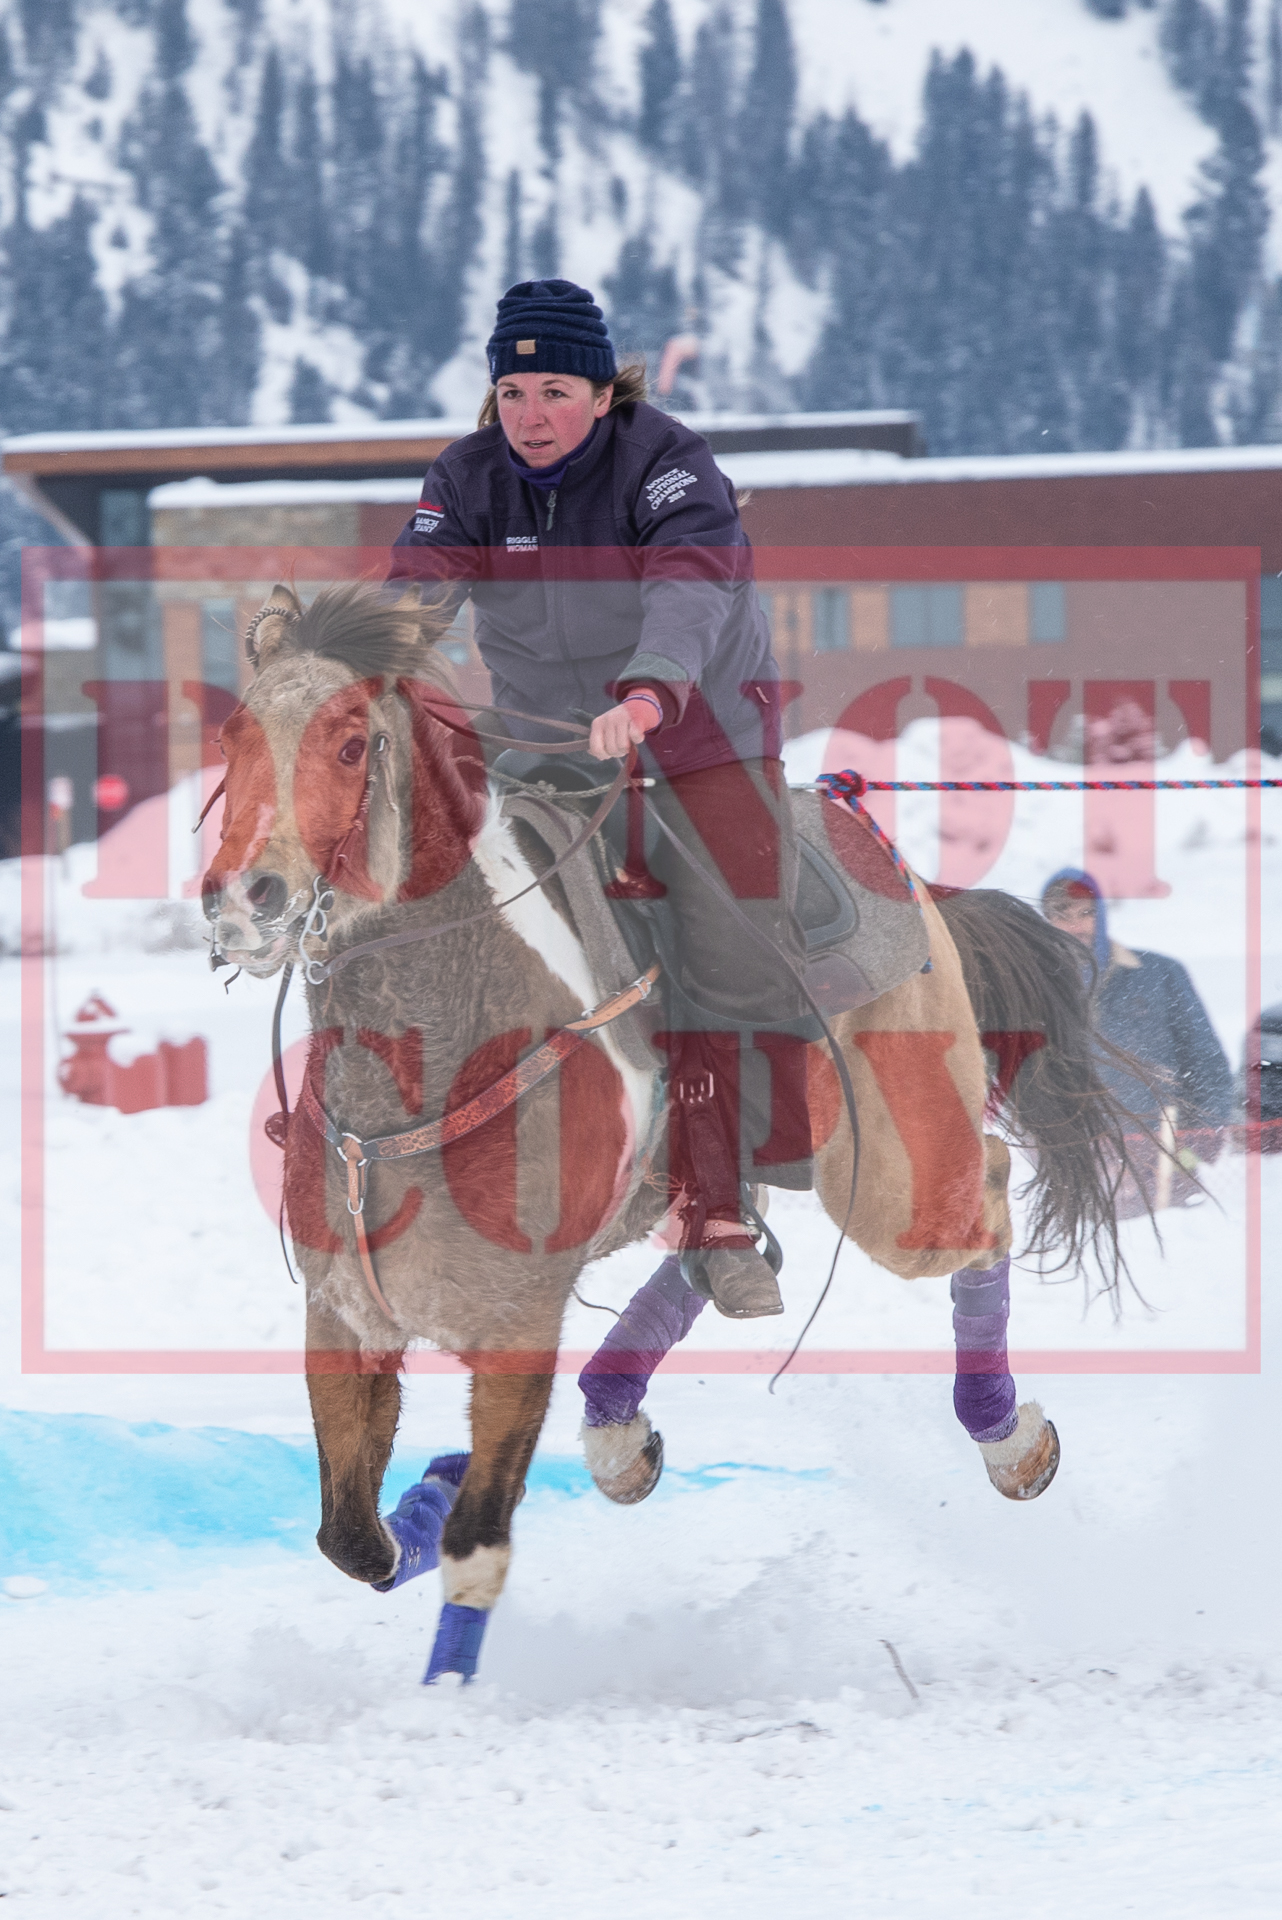 - Brittany Delehant Sport - 6